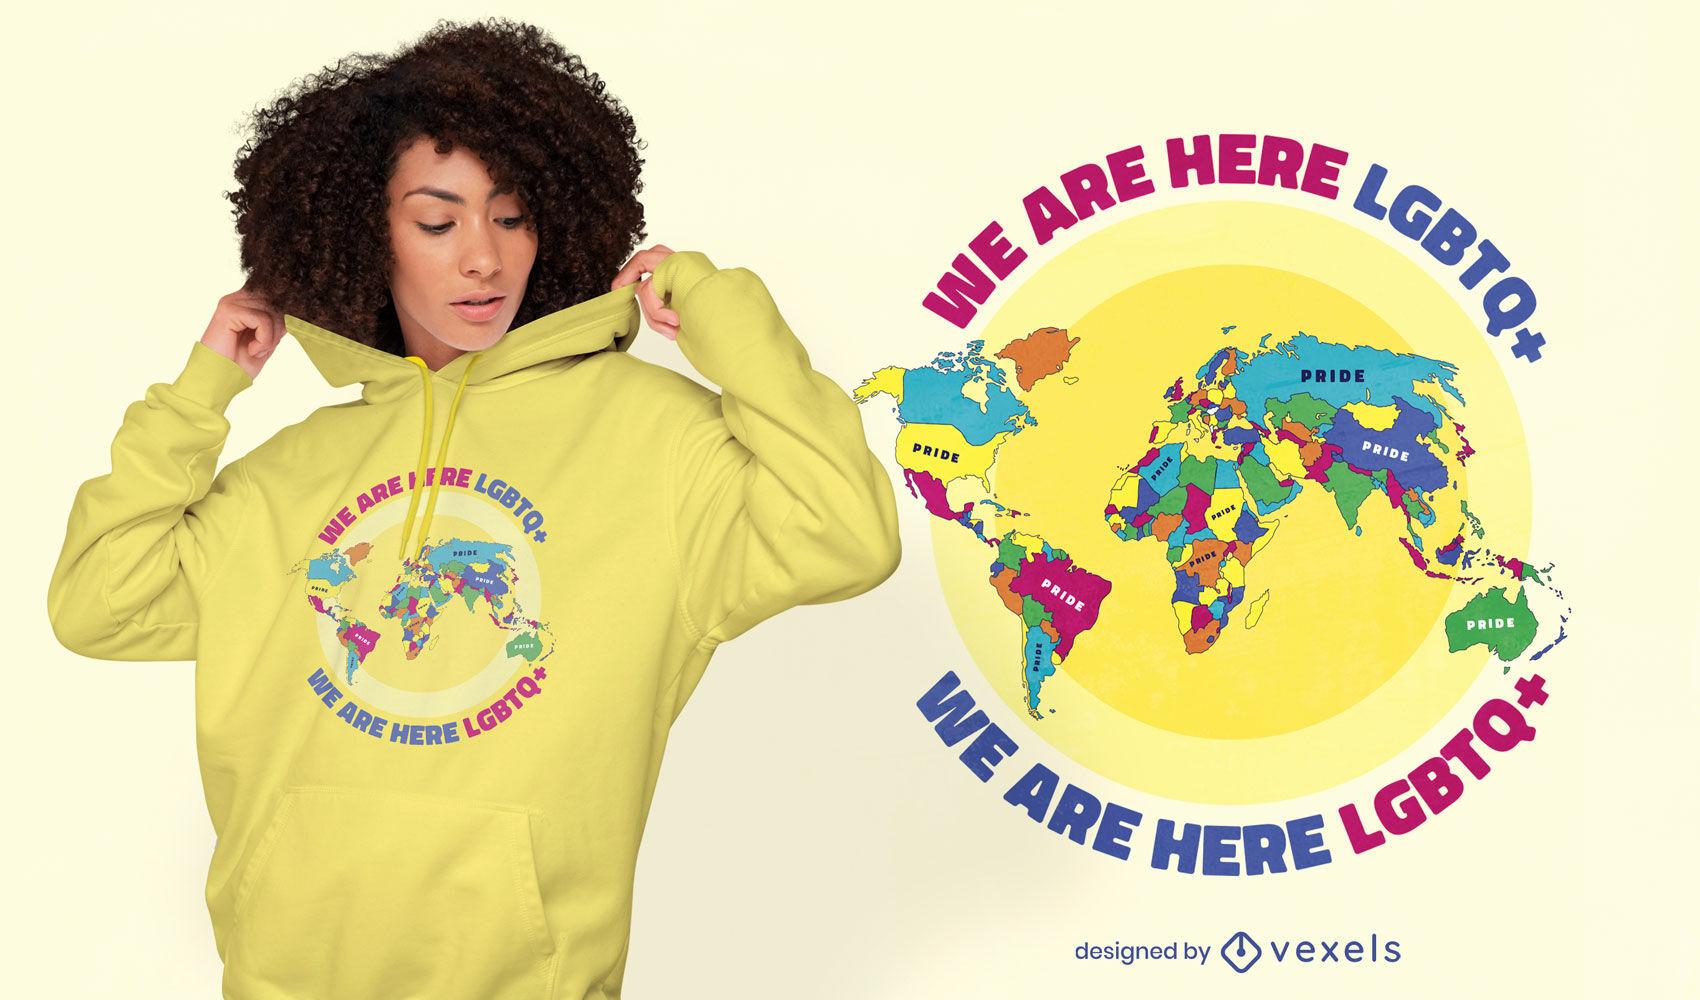 Dise?o de camiseta lgbt del mapa mundial del orgullo.